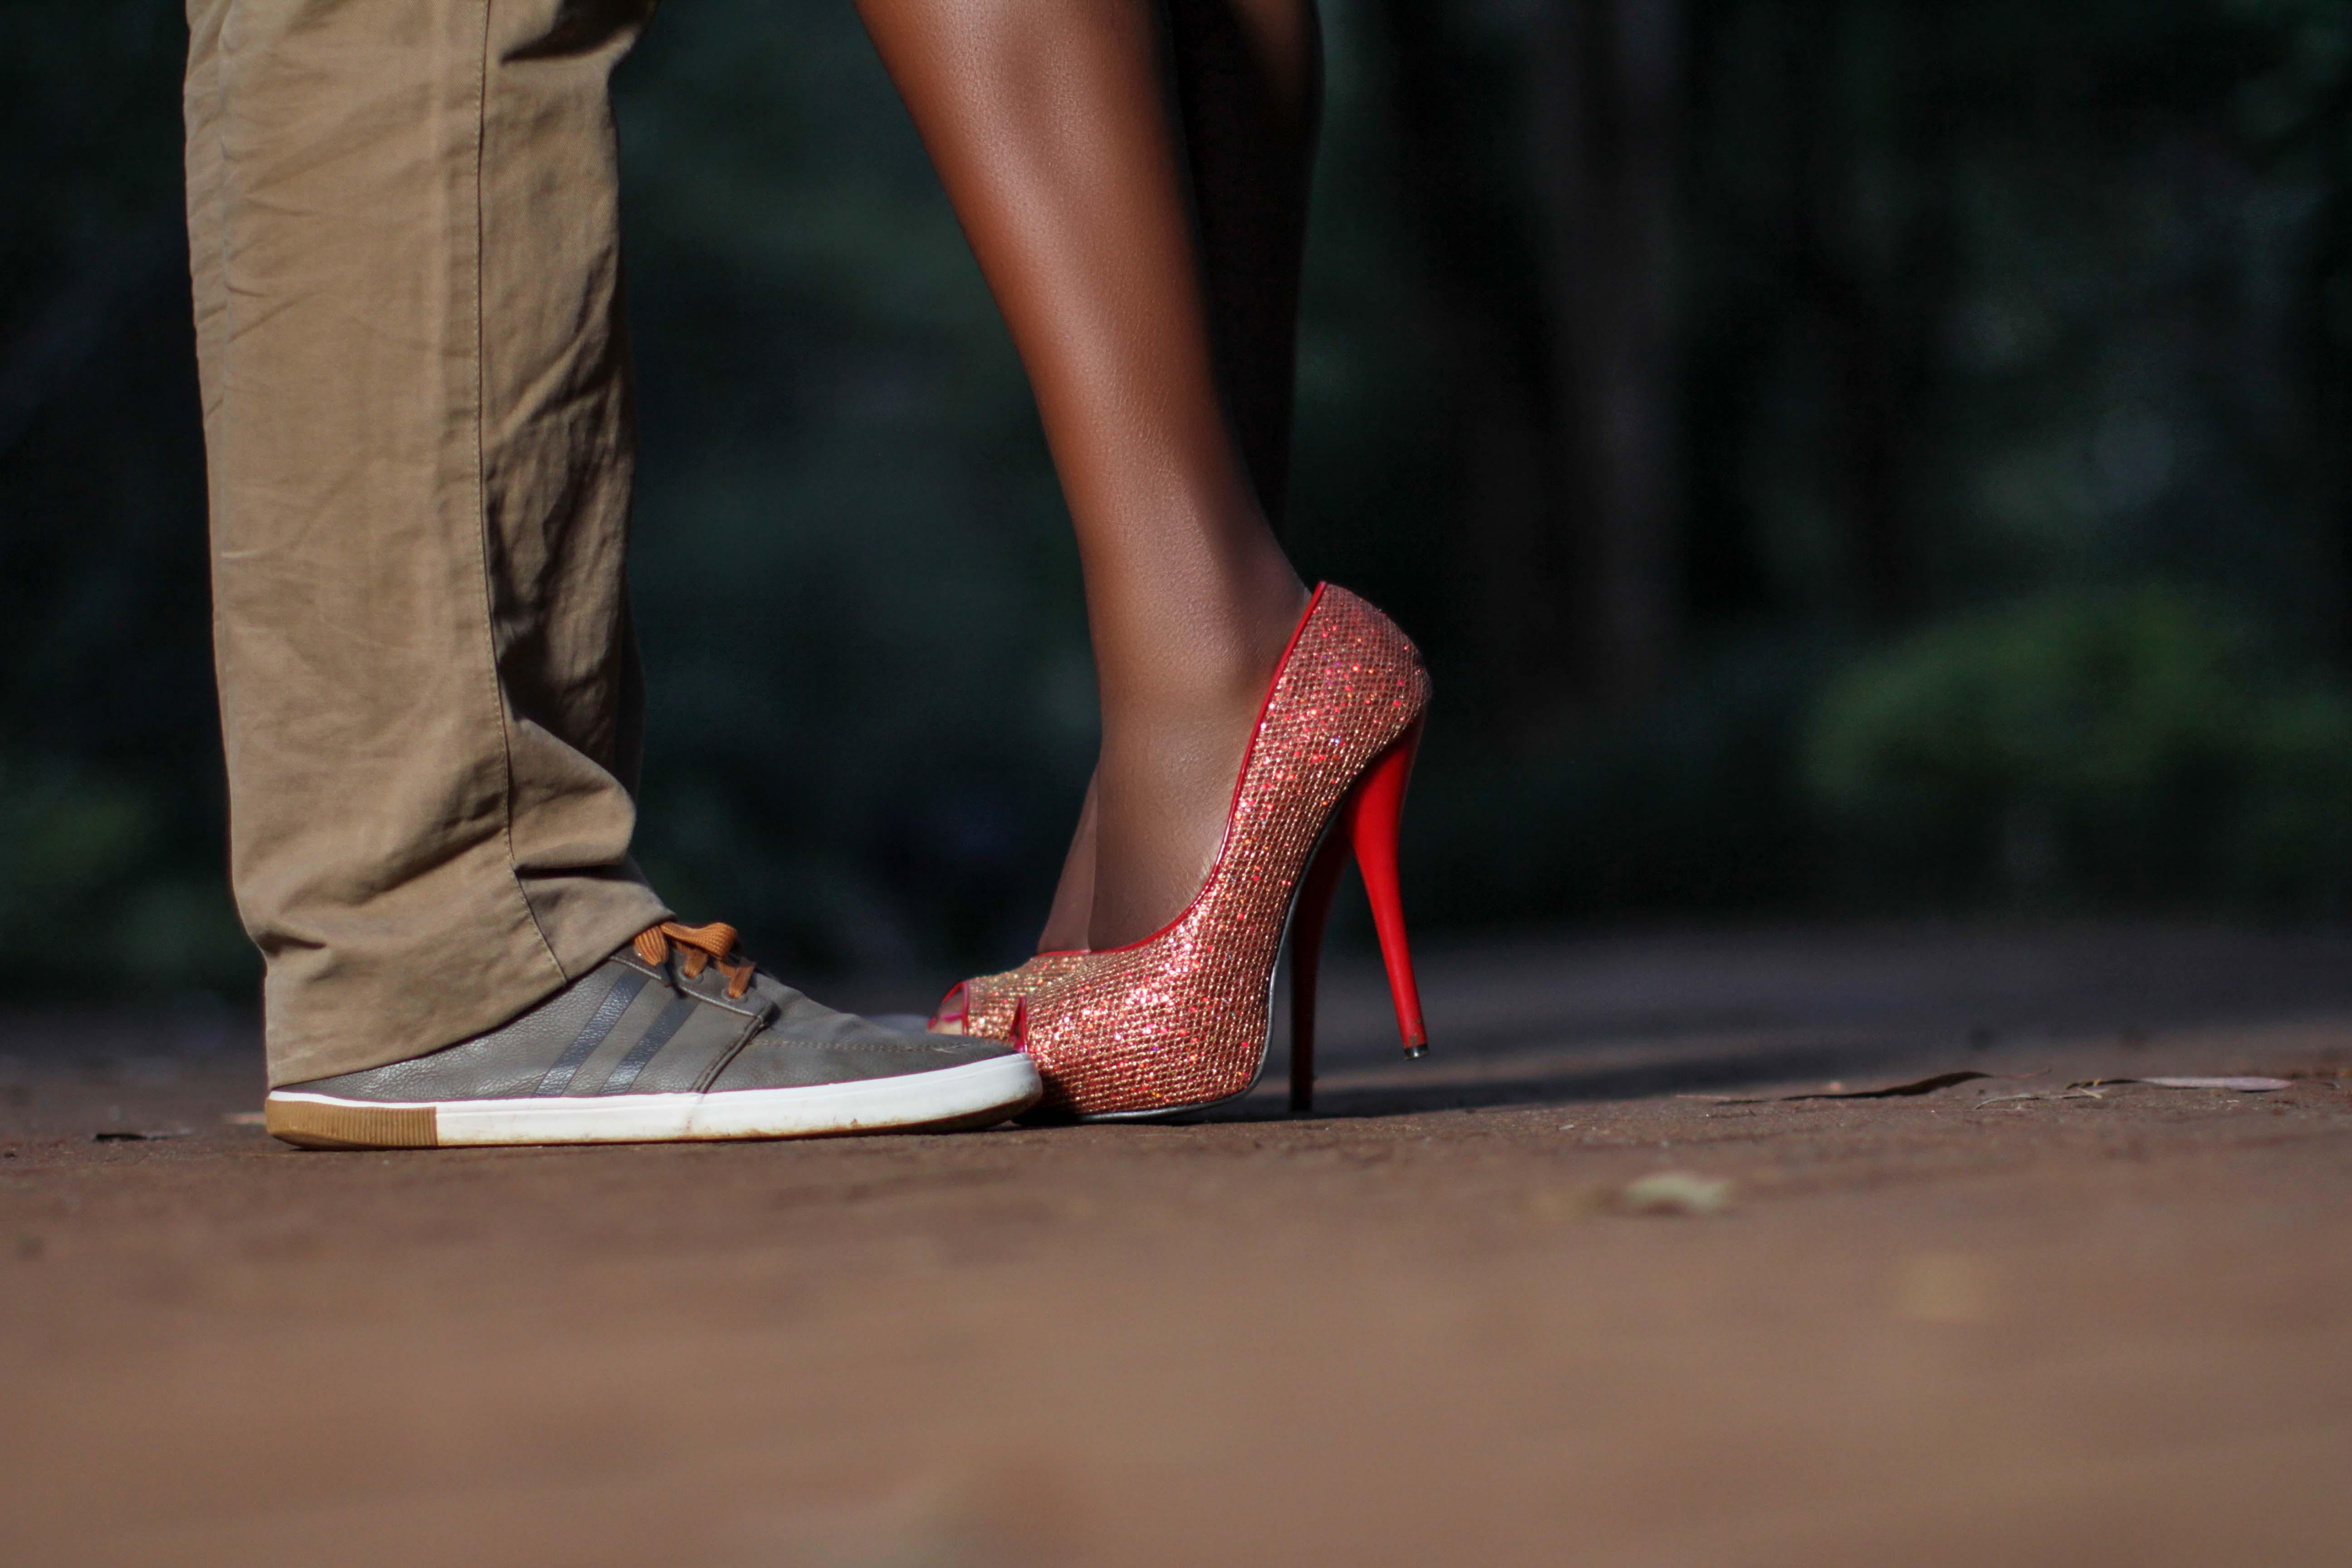 Rose & Rick   Antony Trivet Photography Ngurario,Ruracio,Traditional Wedding-Kenyan Traditional Wedding Photographer -Kenyan Fashion Photographers,Best Nairobi Kenyan Fashion Photographers,Top Kenyan Best Wedding Photographers,Nairobi-wedding-Photographers-Nairobi-Weddings-Nairobi-Wedding-Photography-Kenya-Wedding-Photographers-Top-Kenya-Wedding-Photography-Nairobi-Kenya-Best-Wedding-Photographers-Top Kenyan Best Photography-Top Fashion Photographer Nairobi Kenya-Best Kenyan Fashion Photographers-Nairobi Wedding Photographers-Nairobi National Park Wedding – Rustic Wedding – Kenyan Weddings – Nairobi Wedding Photographers – Kenyan Wedding Photographers -Kenya best wedding photographers-Top Kenyan Wedding Photography-Karen Weddings-Brookhaven Garden Wedding Karen-Kenyan Best Portraiture Photographers-Nairobi Portraiture Photographers